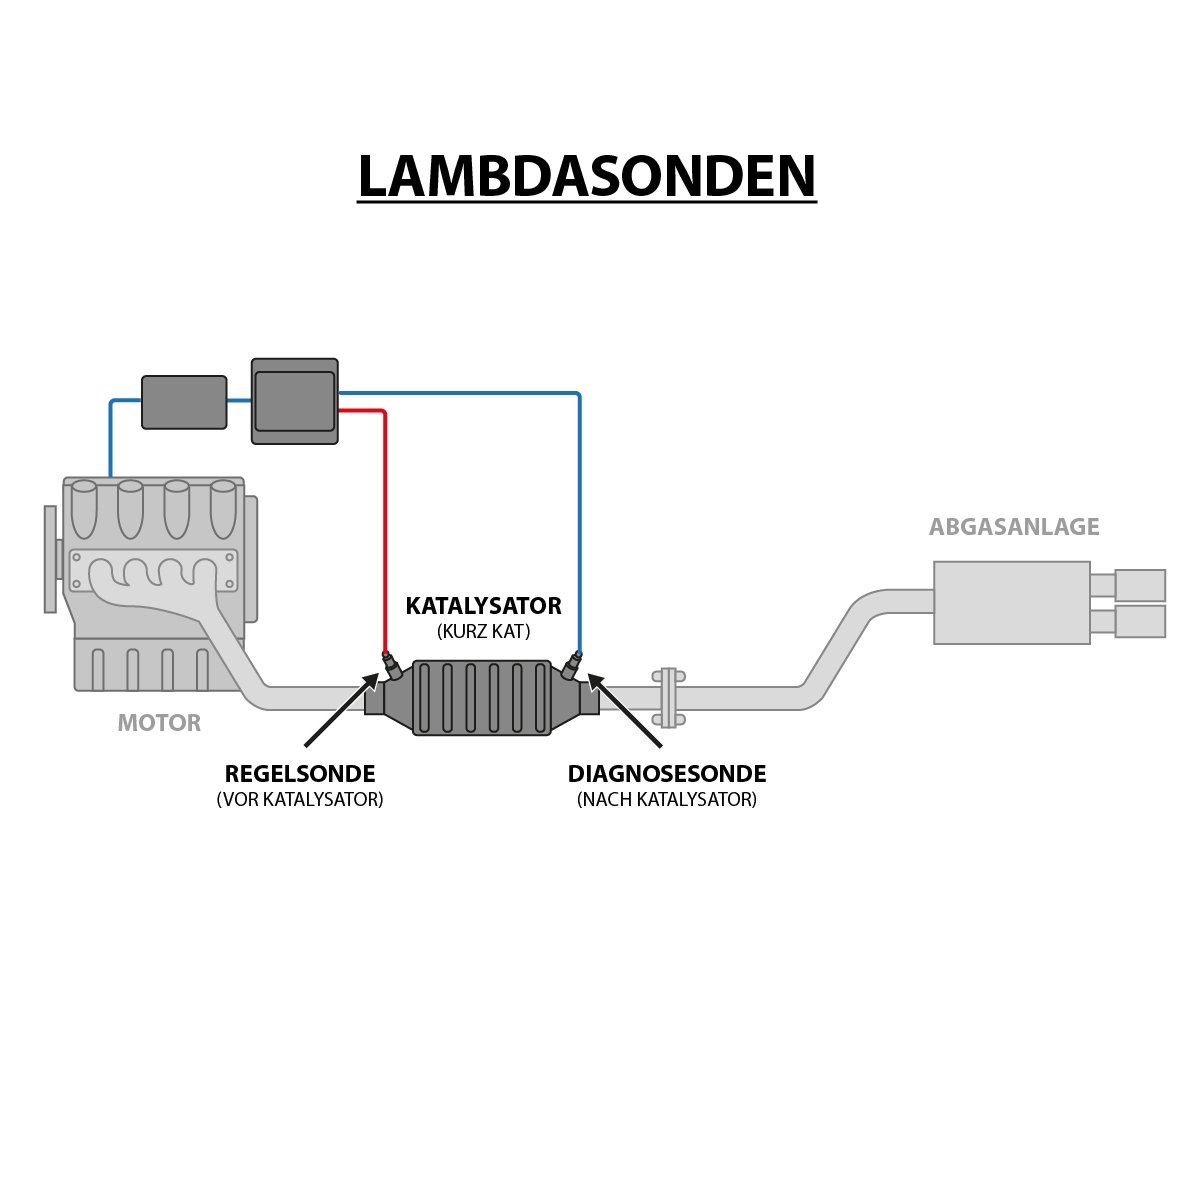 9K9A Lambdasonde Regelsonde vor KAT 4-polig VW Caddy II Kasten 9K9B /& Kombi